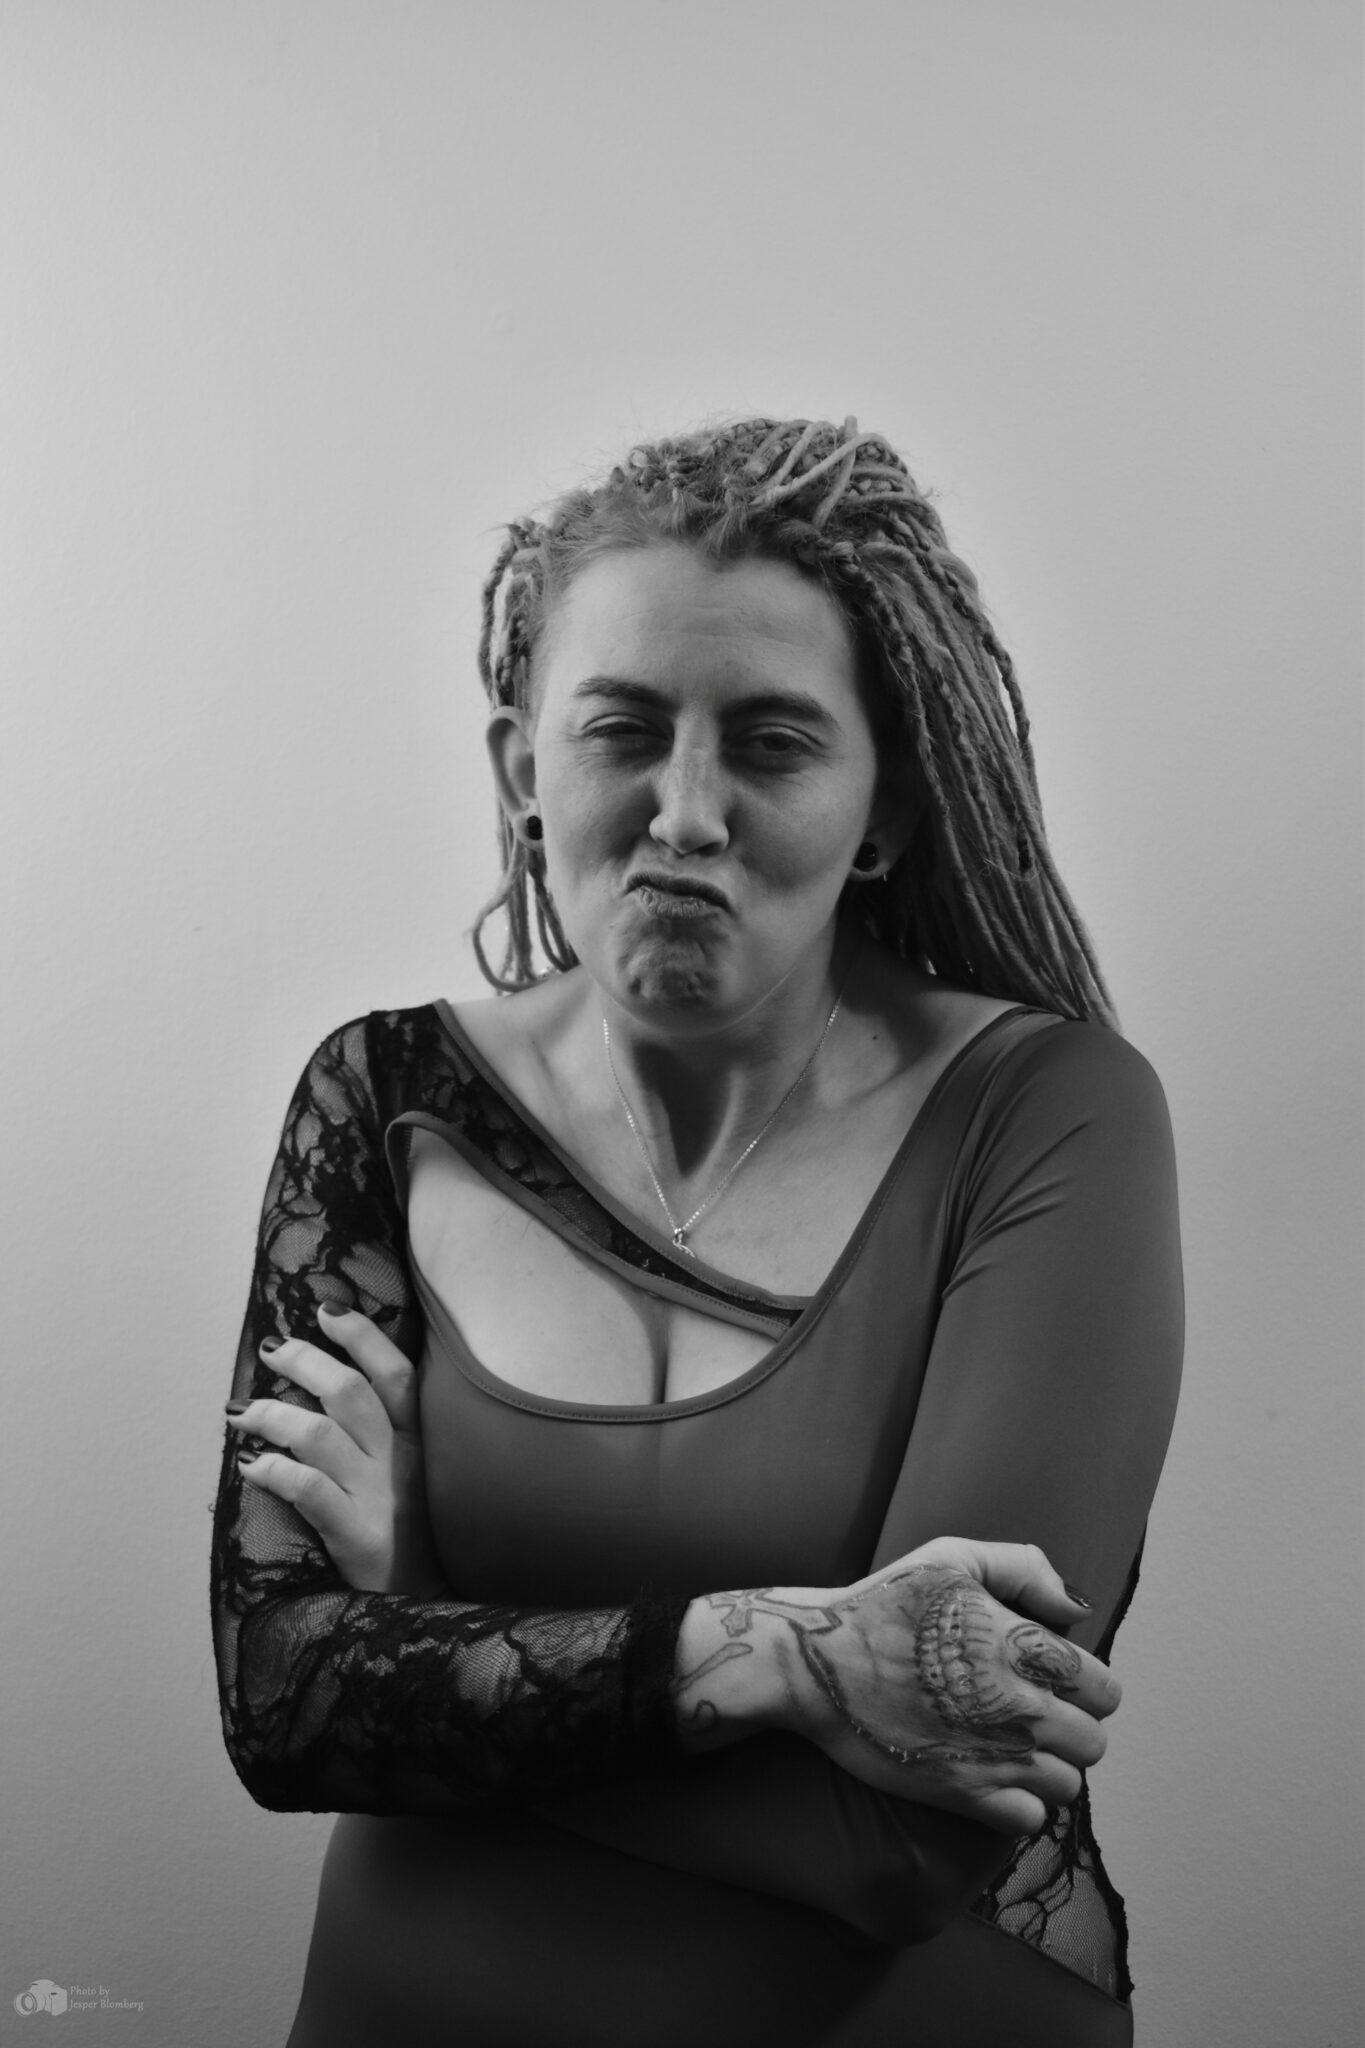 Sara Rasmussen